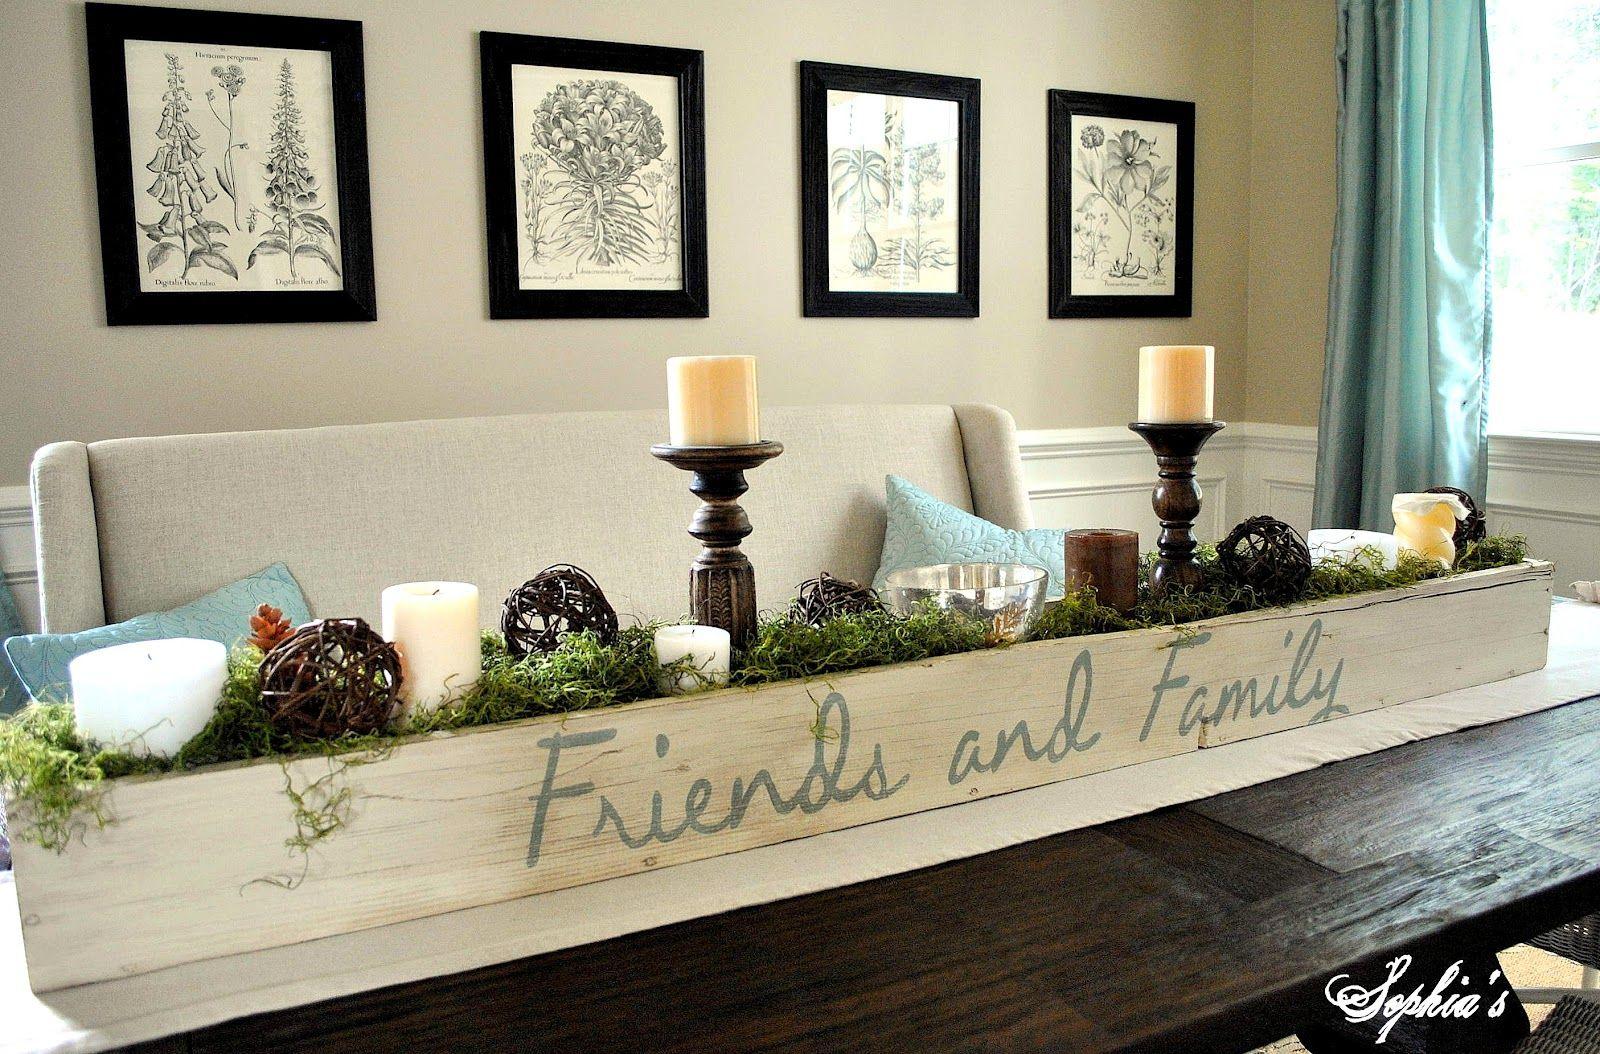 Centerpiece Farmhouse Table Centerpieces Planter Box Centerpiece Table Centerpieces Diy